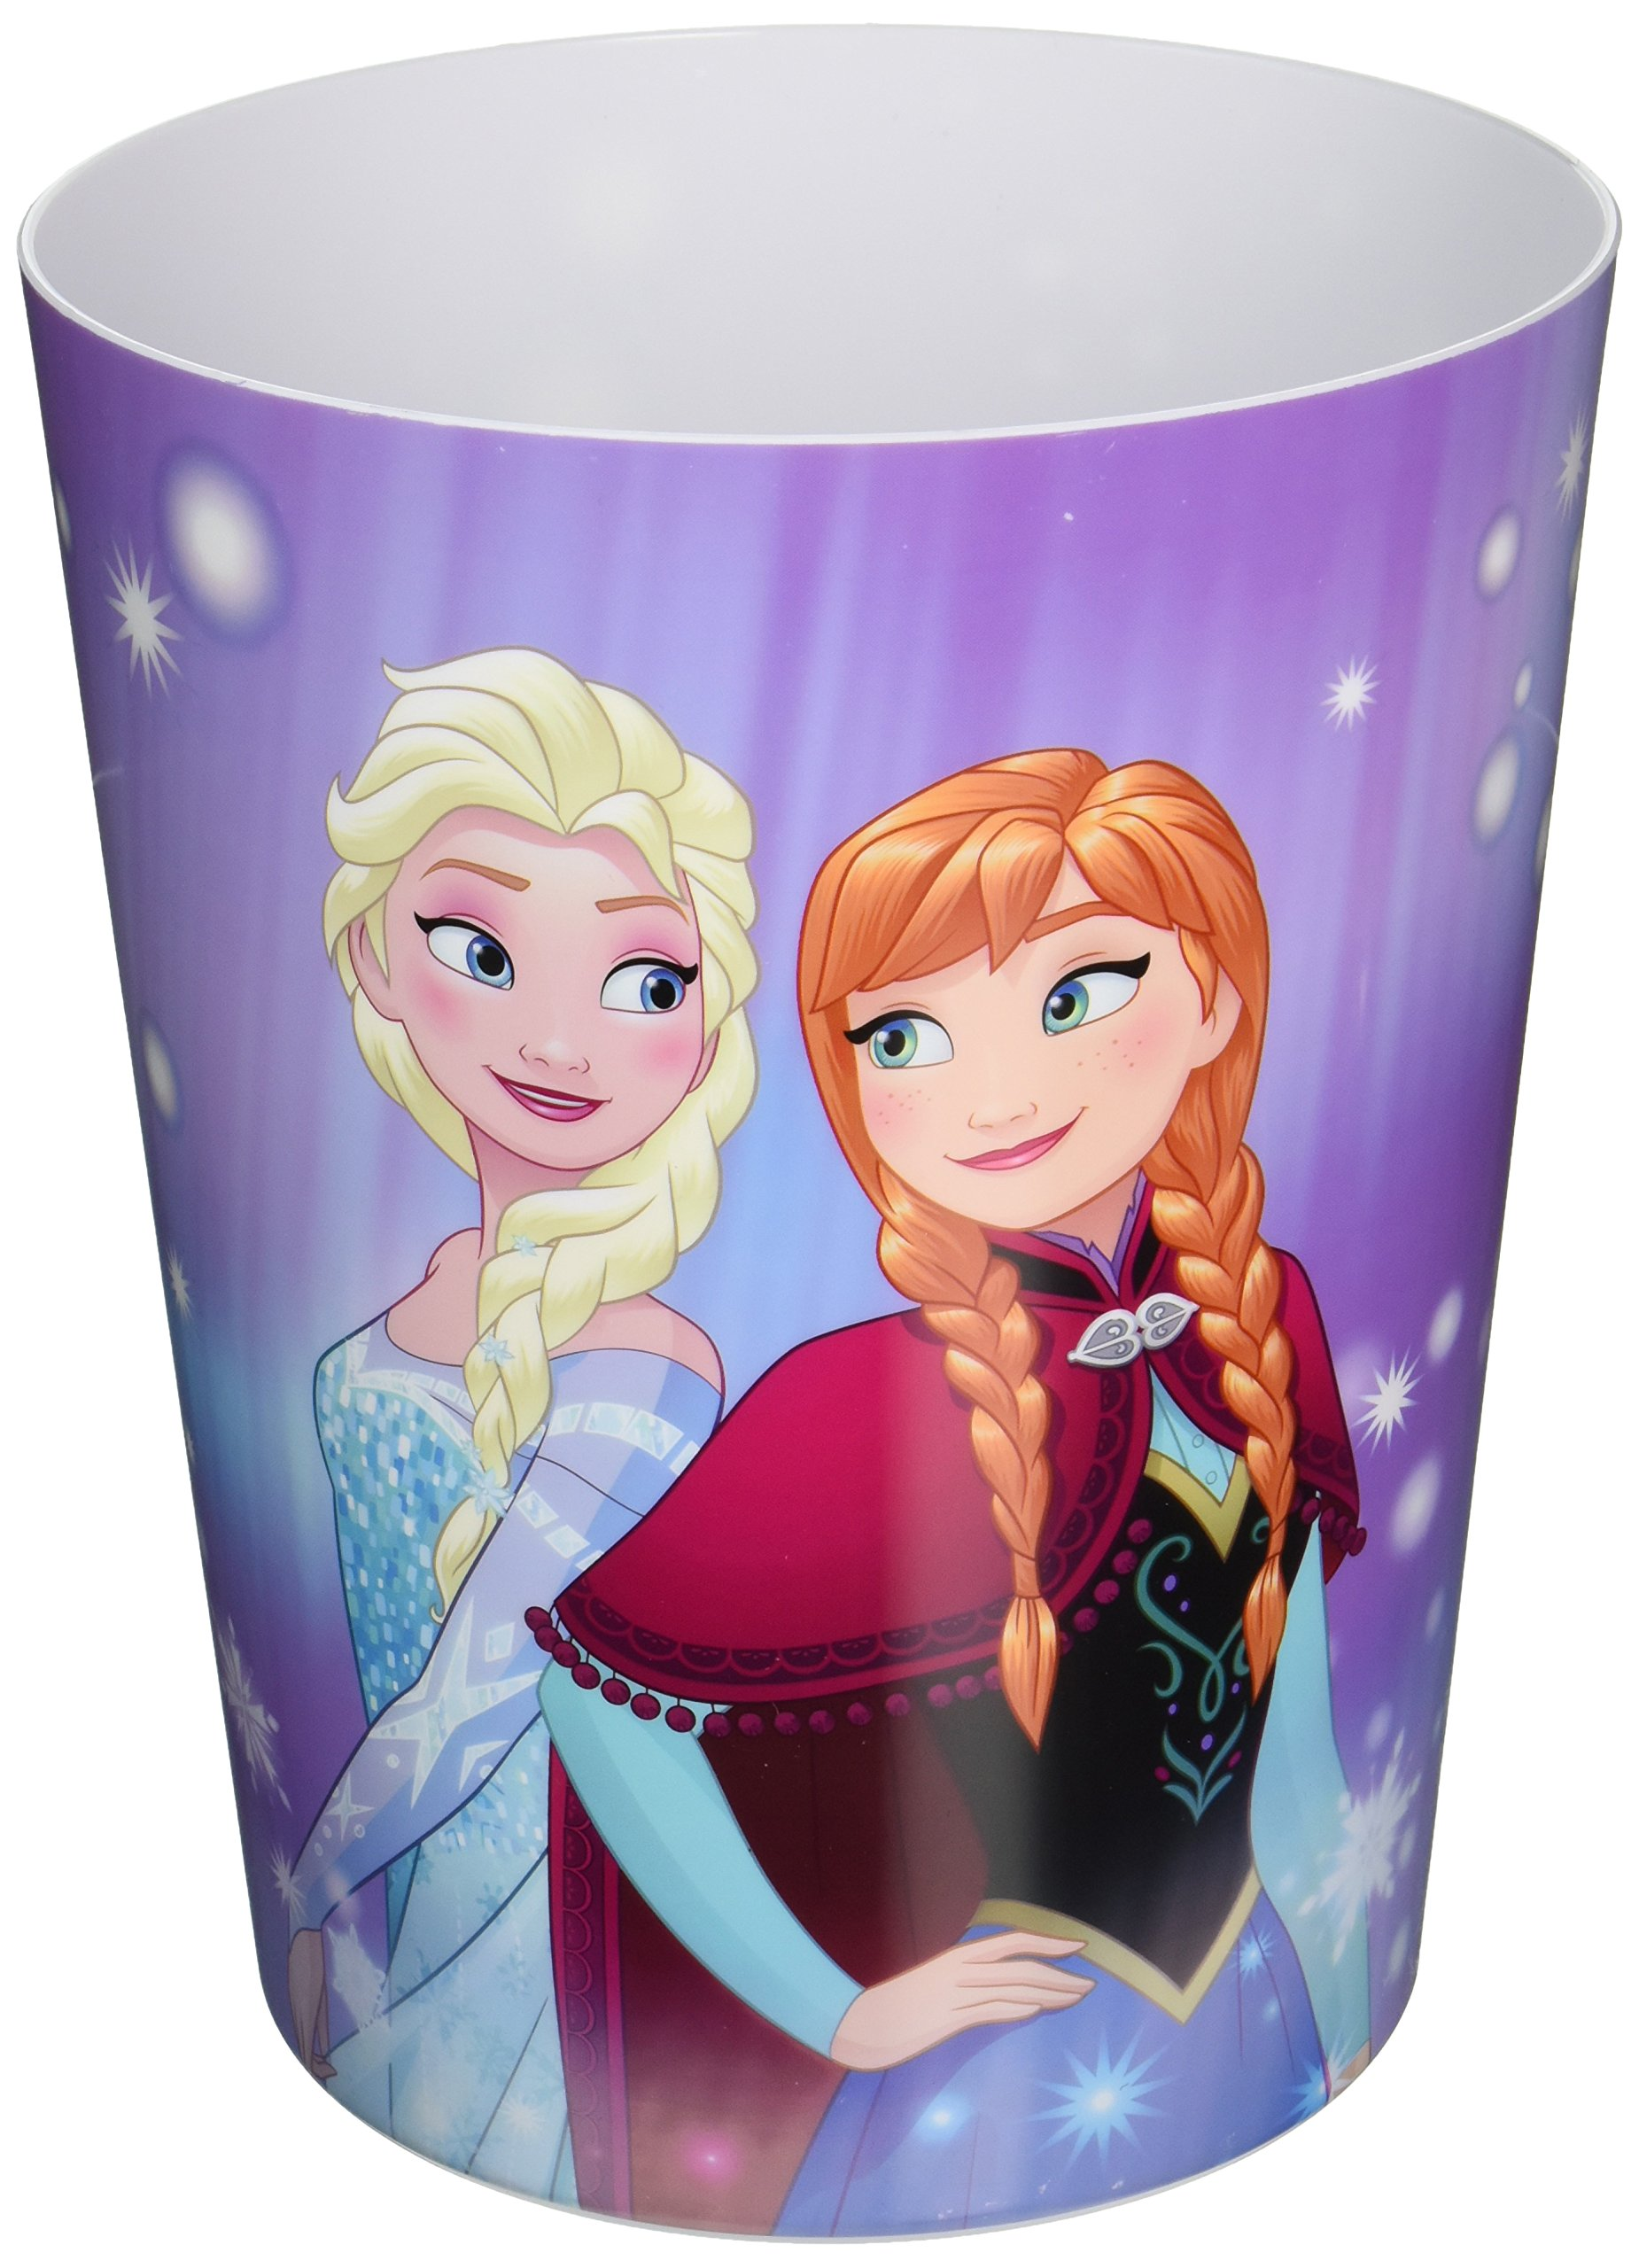 Disney Frozen Snowflake Waste Basket